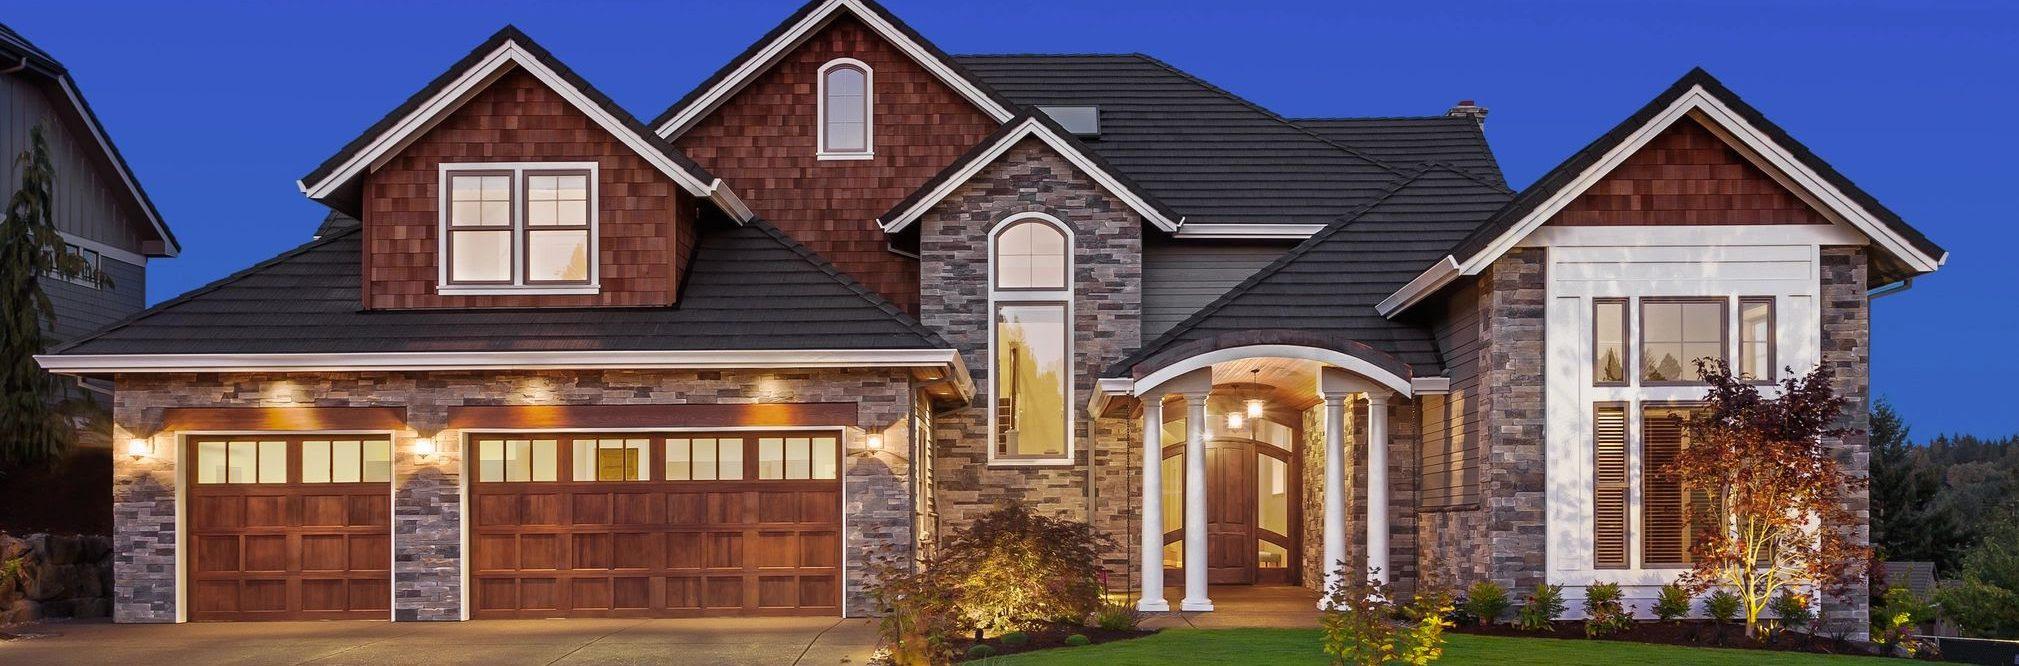 Home Insurance - Missouri River Associates, LLC